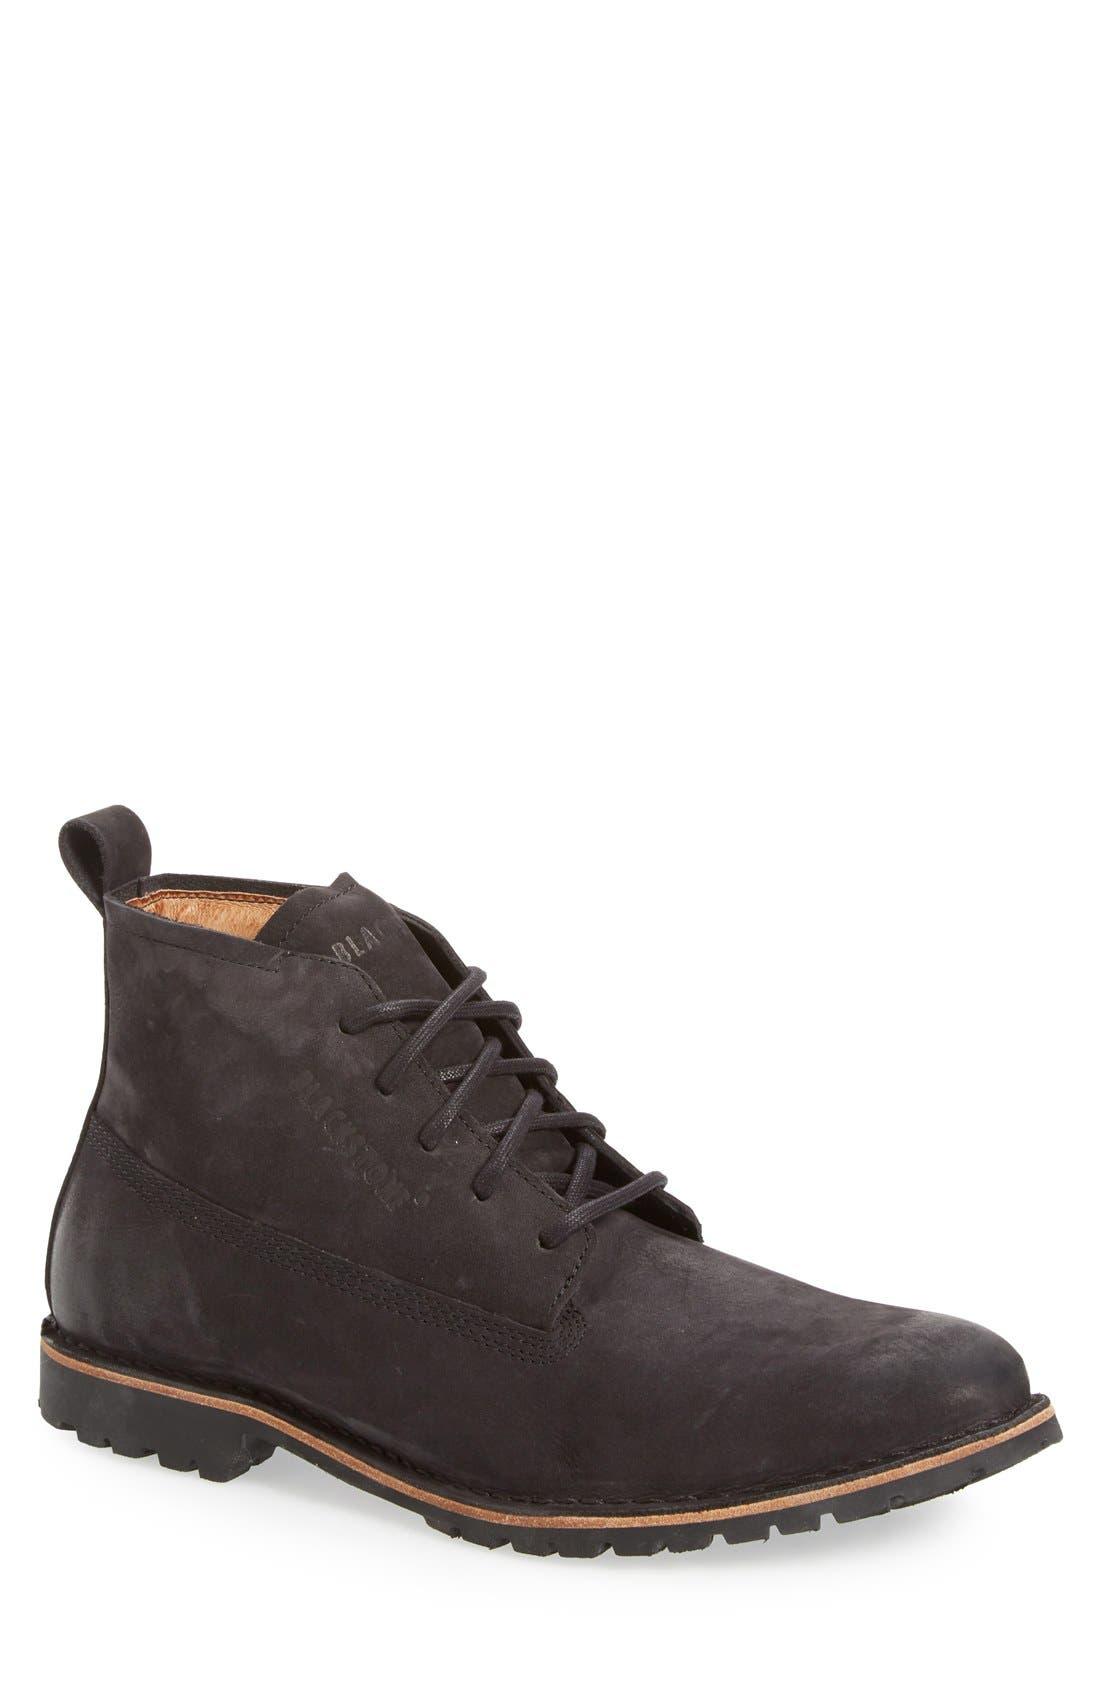 'KM07' Plain Toe Boot,                         Main,                         color,